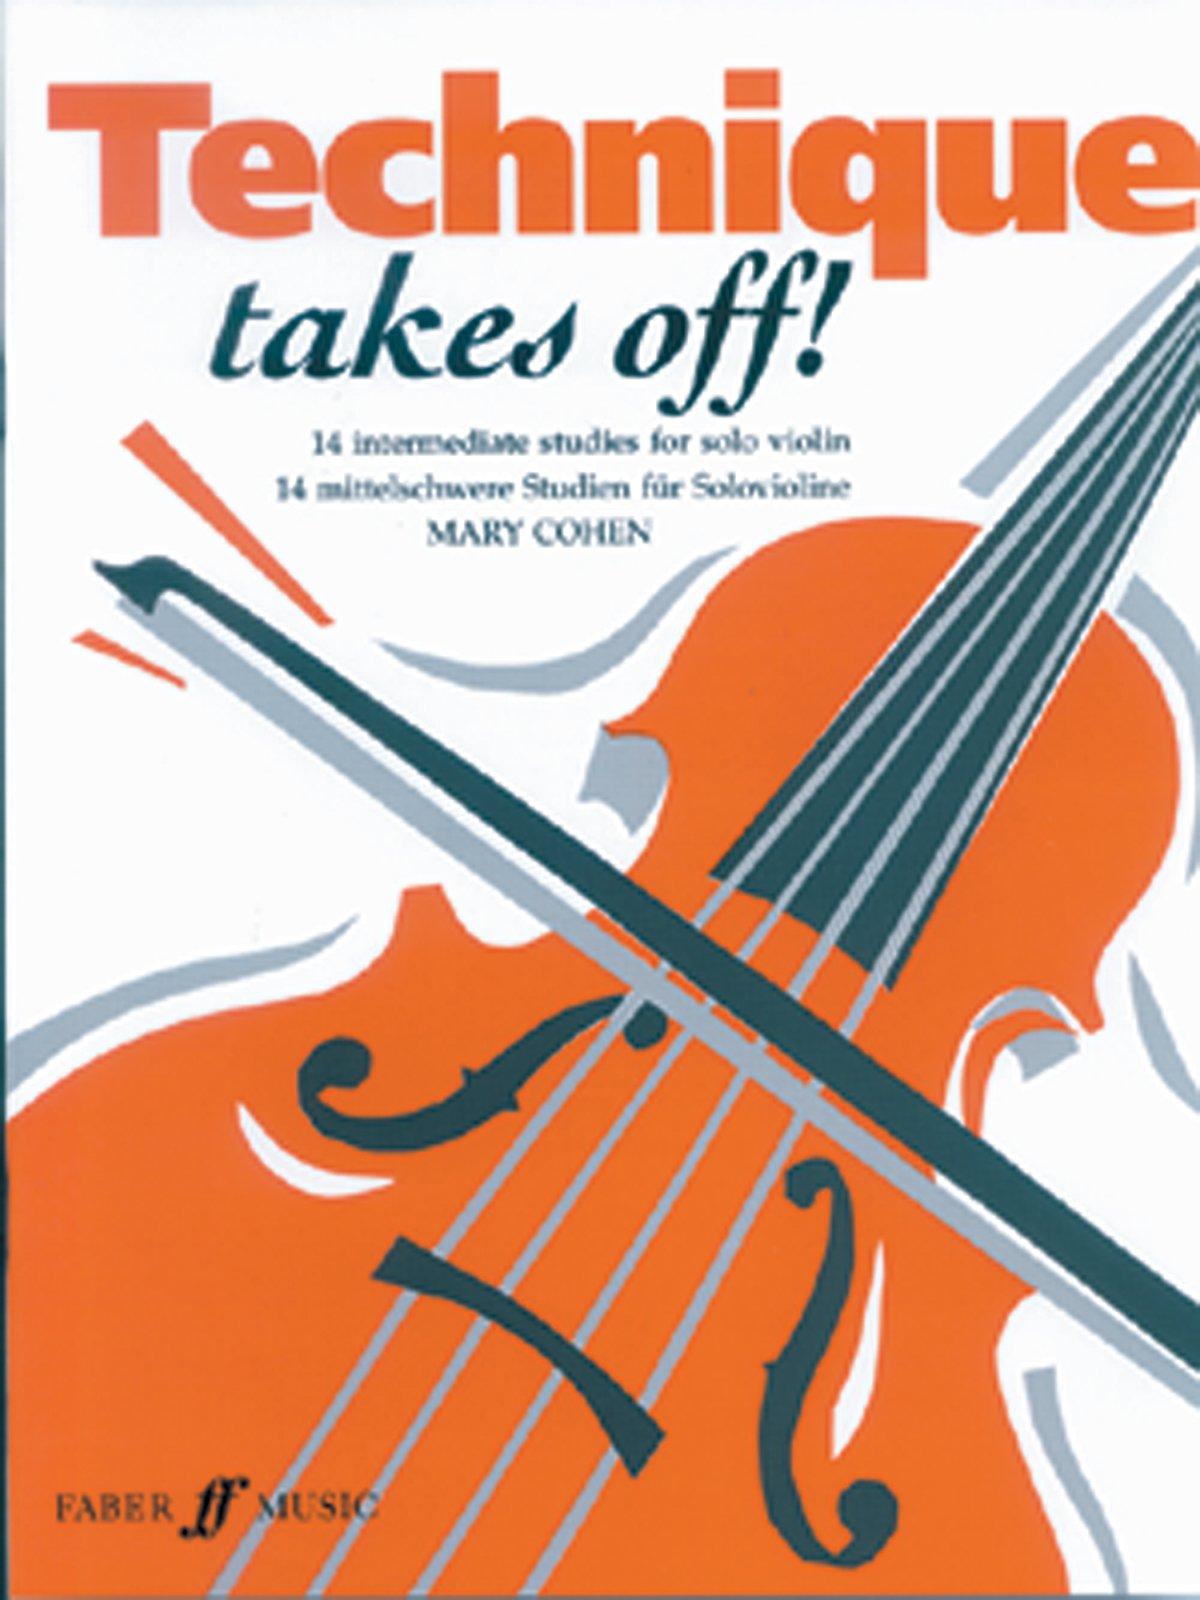 Technique Takes Off! for Violin (Faber Edition)